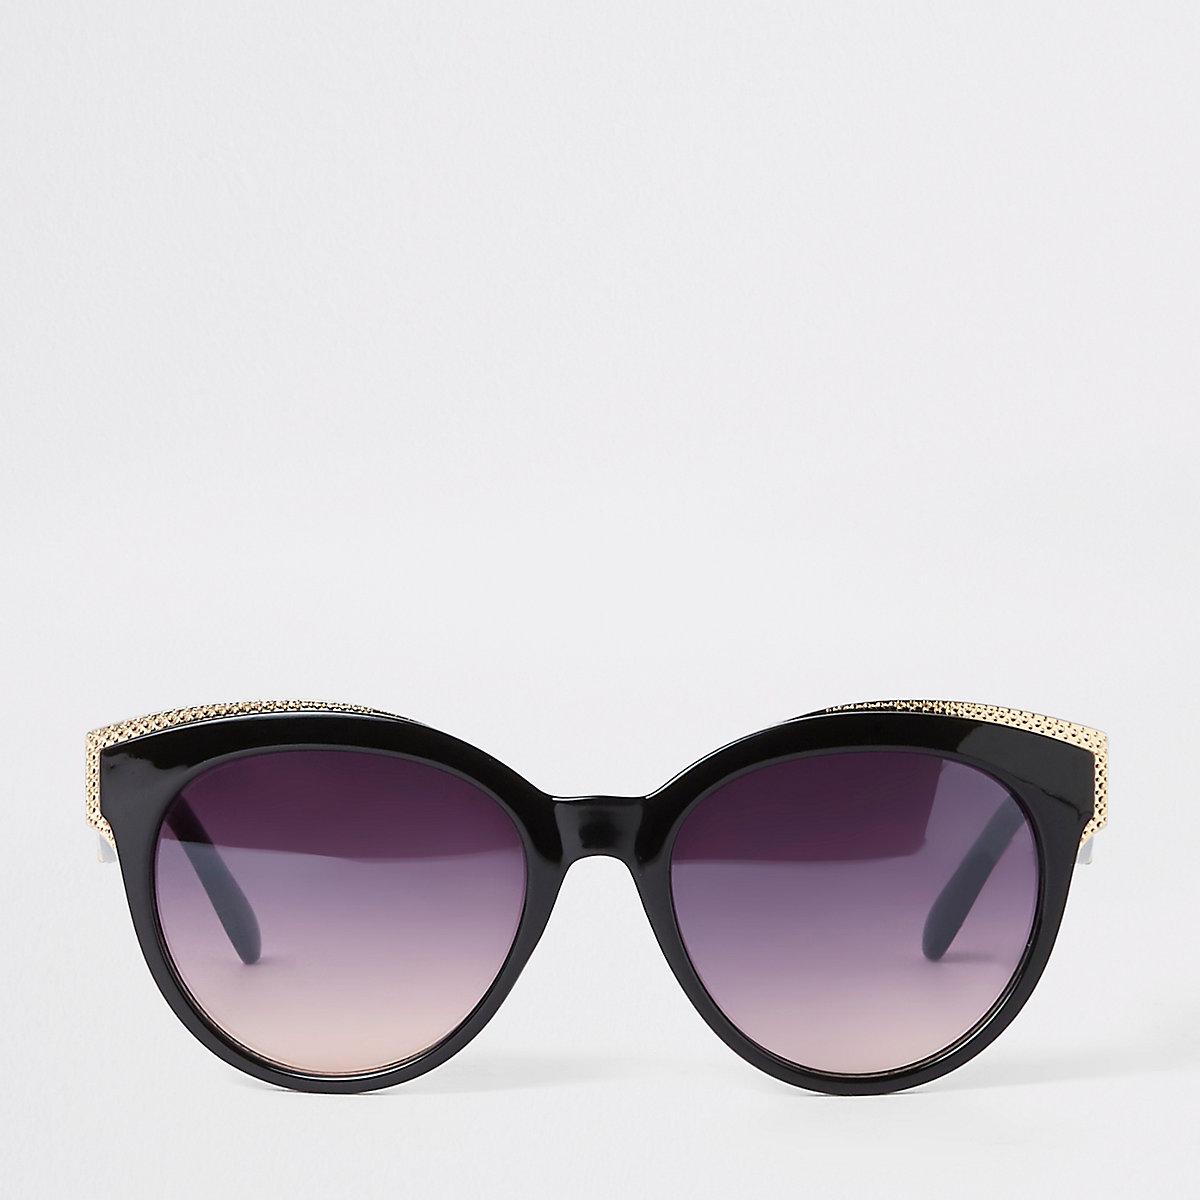 Black and gold tone cat eye sunglasses